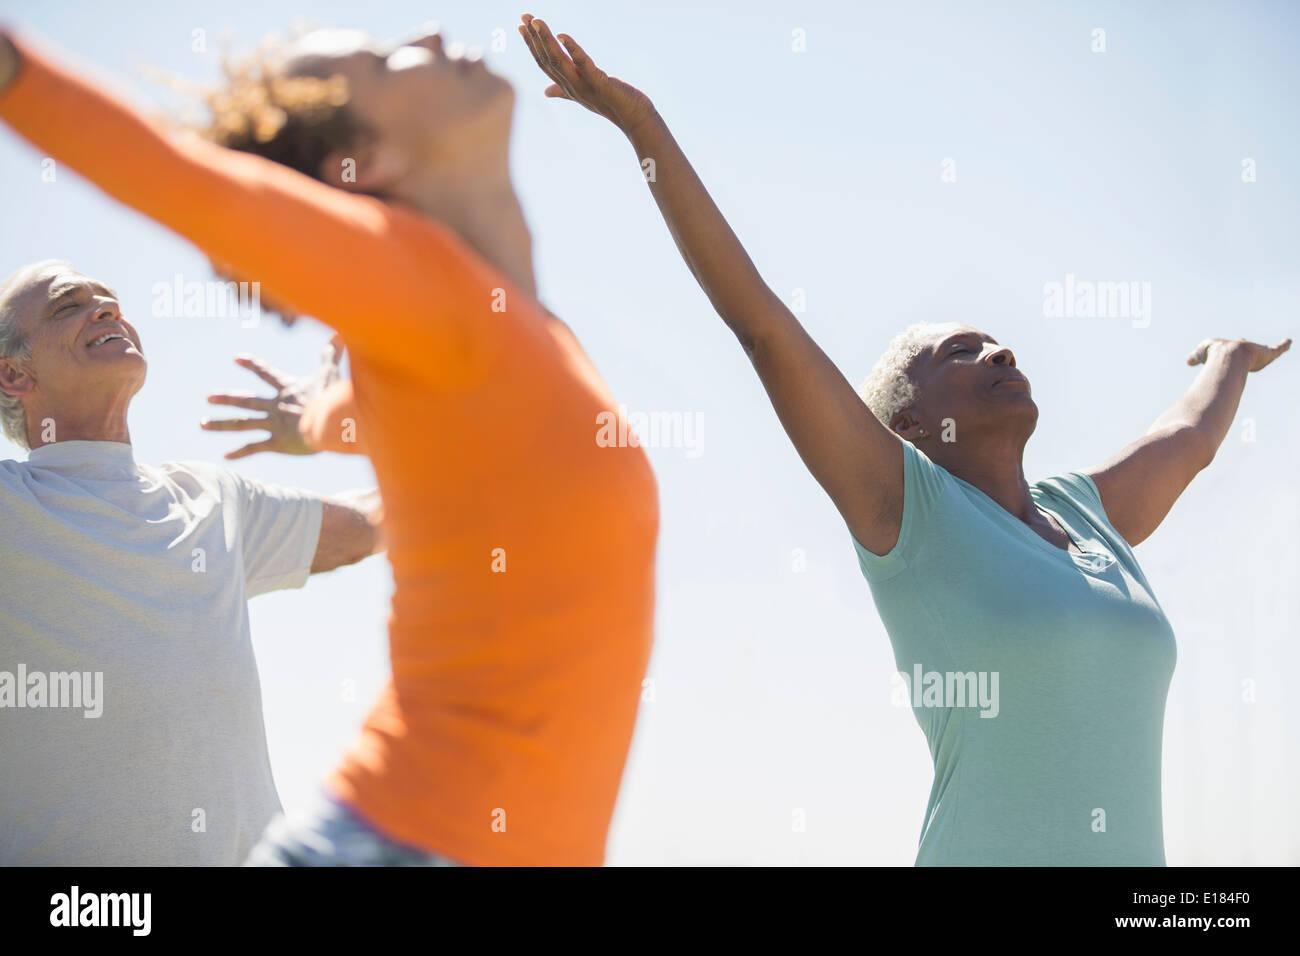 Seniors practicing yoga outdoors - Stock Image